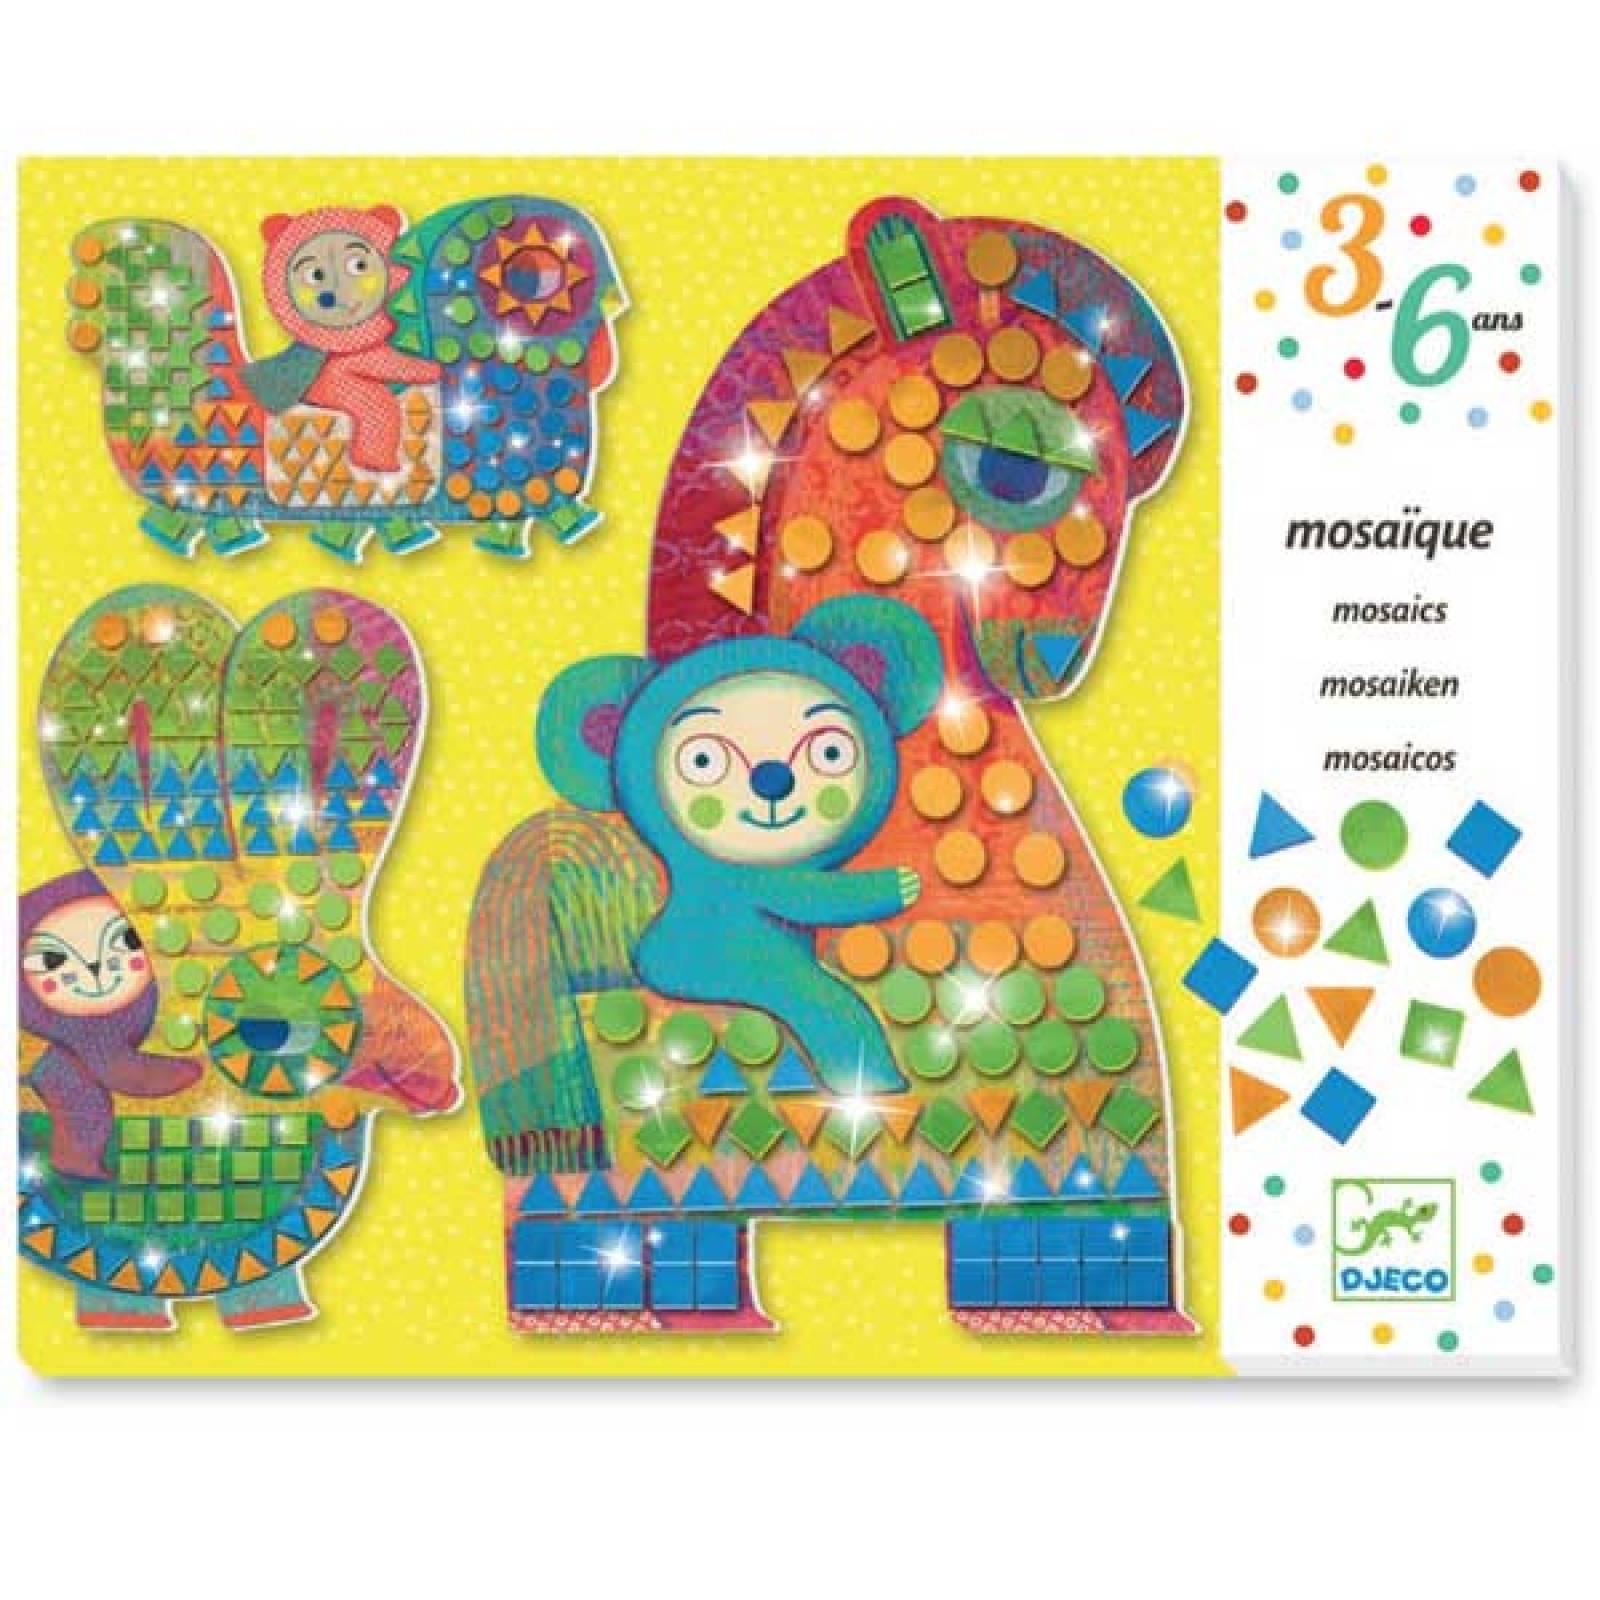 Mosaics On Horseback - Creative Set By Djeco